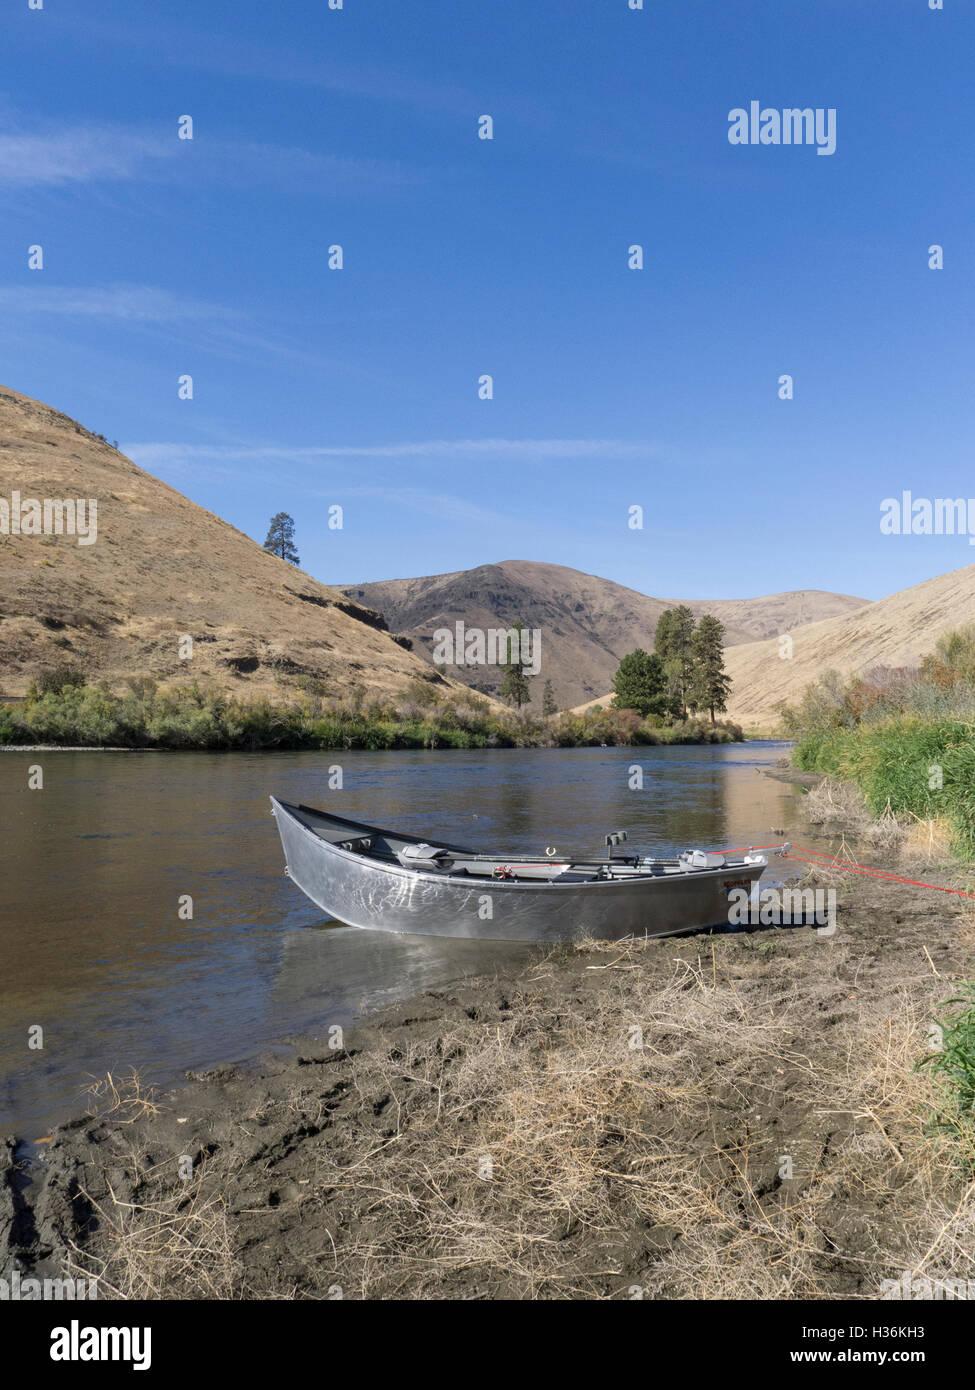 Yakima River near Ellensberg, Washington is a Blue Ribbon